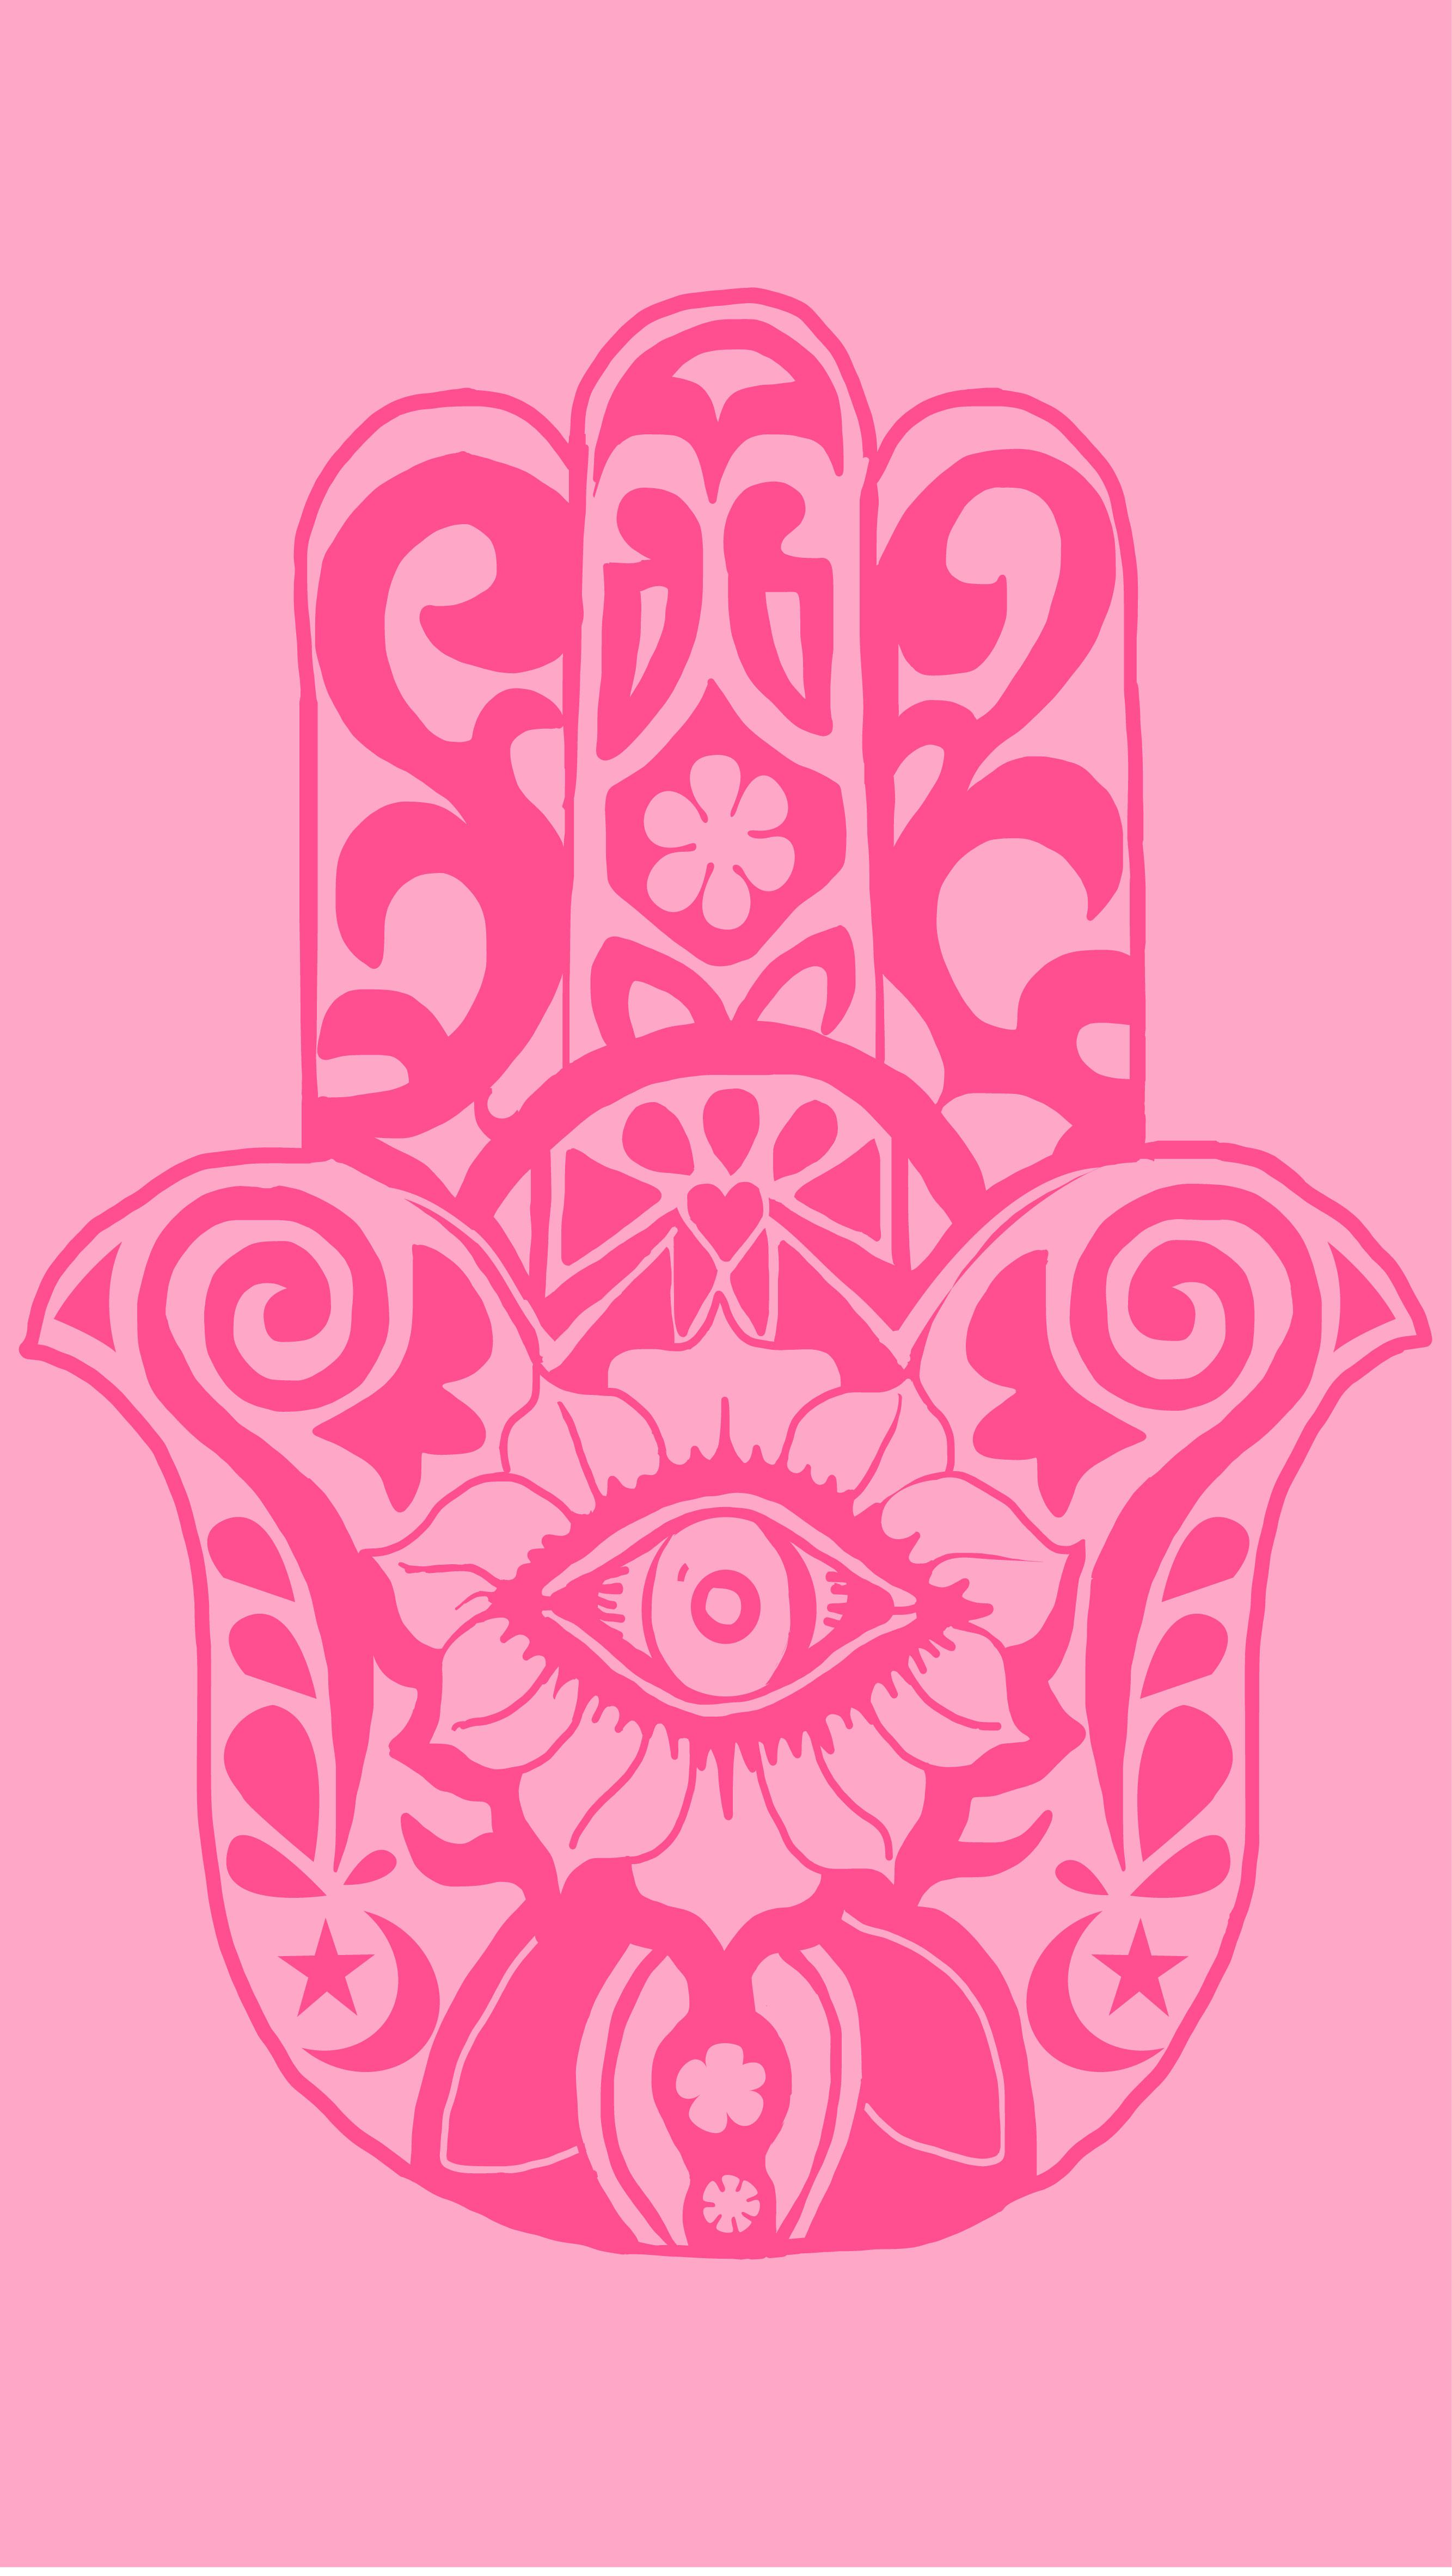 Iphone 5s Wallpaper Iphone Wallpaper wallpaper tumblr iphone 5 2667x4733